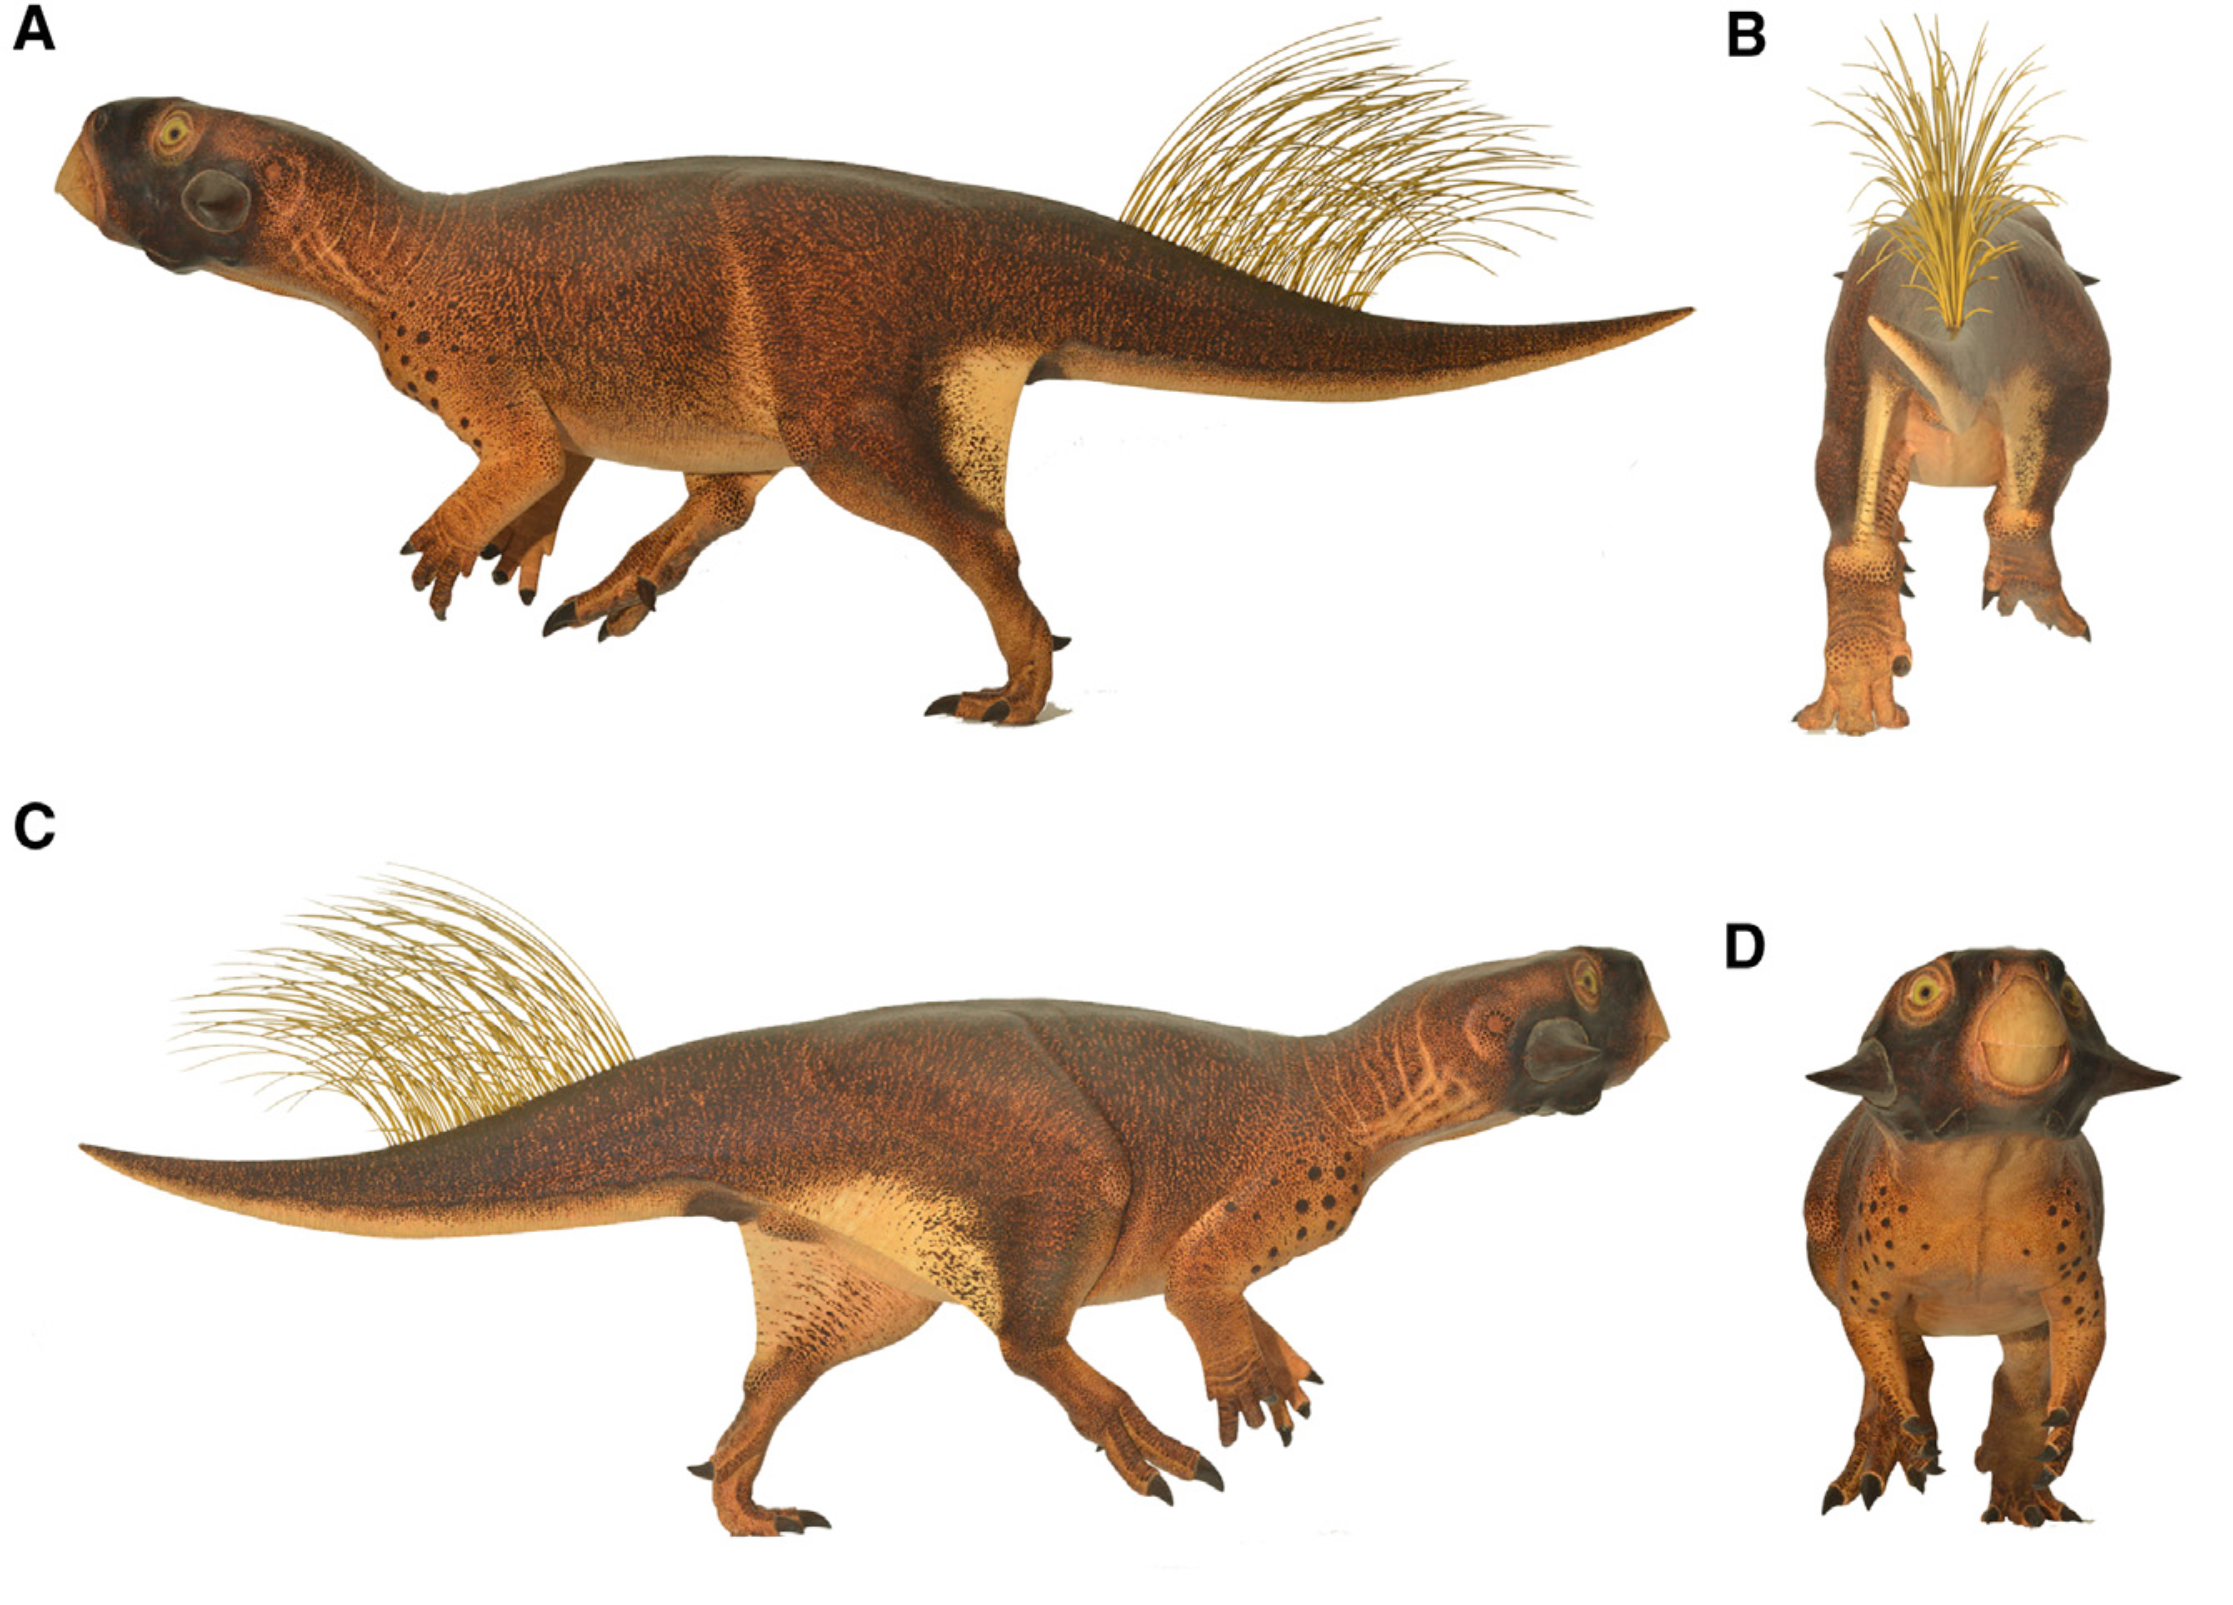 File:Psittacosaurus model.jpg - Wikimedia Commons